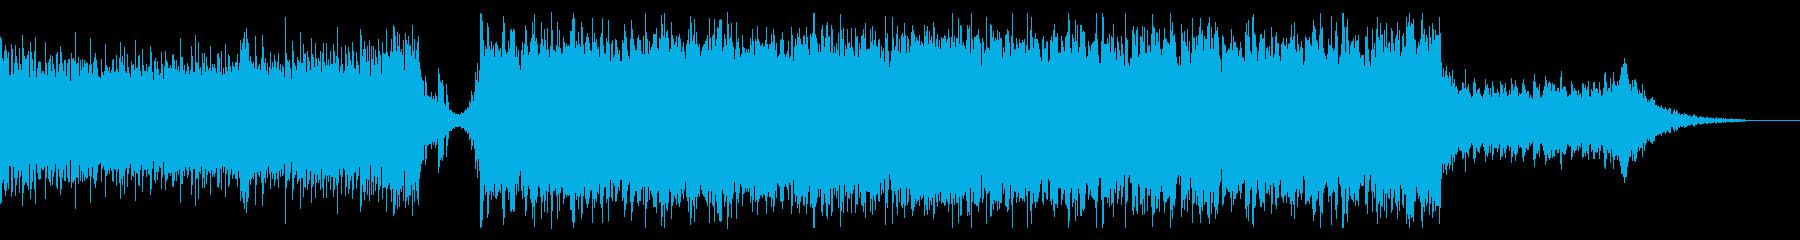 Top Runner 60秒の再生済みの波形